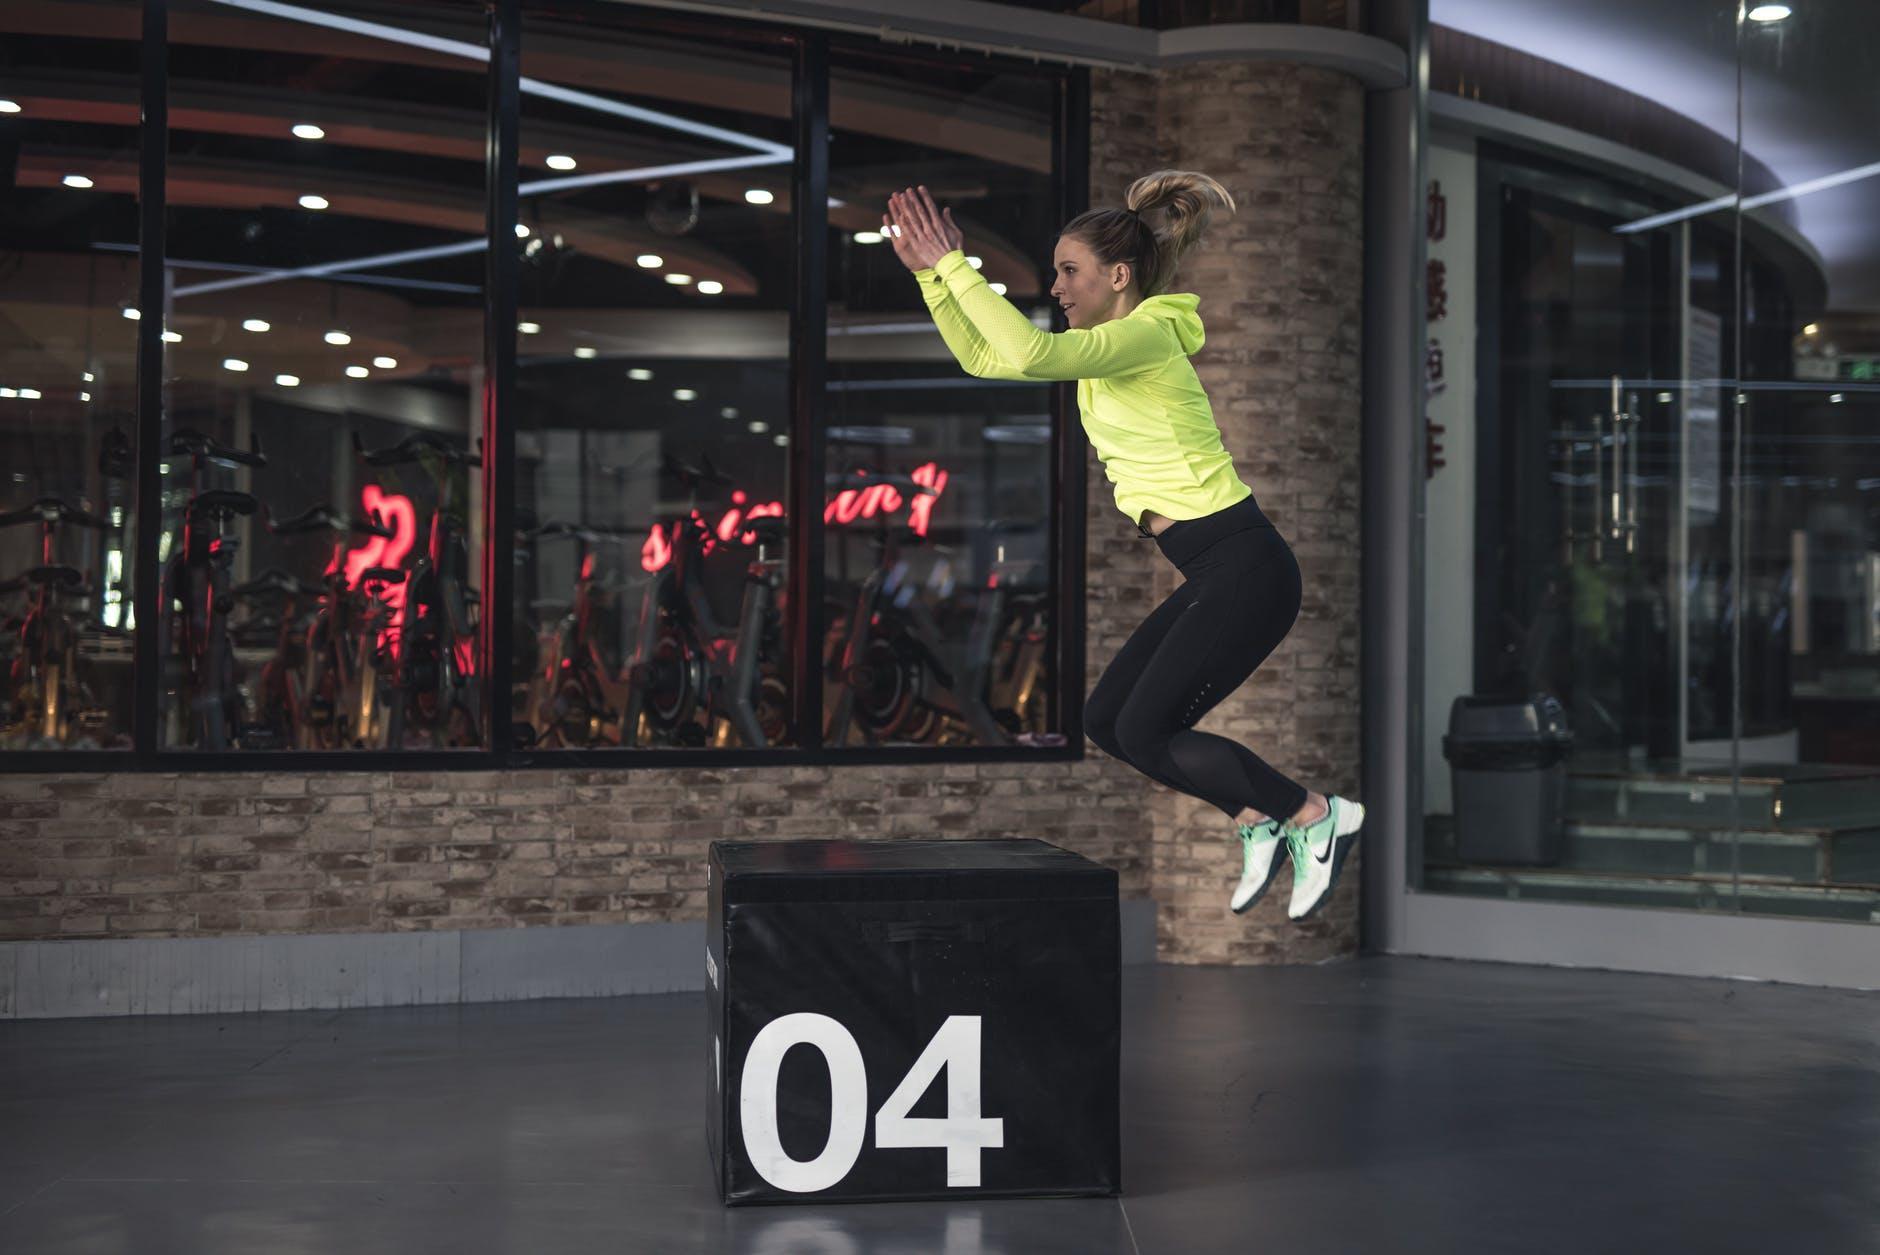 Squat Jump and 3-Hurdle Drills: 2 Must-Do Plyometric Exercises to Improve Football Skills